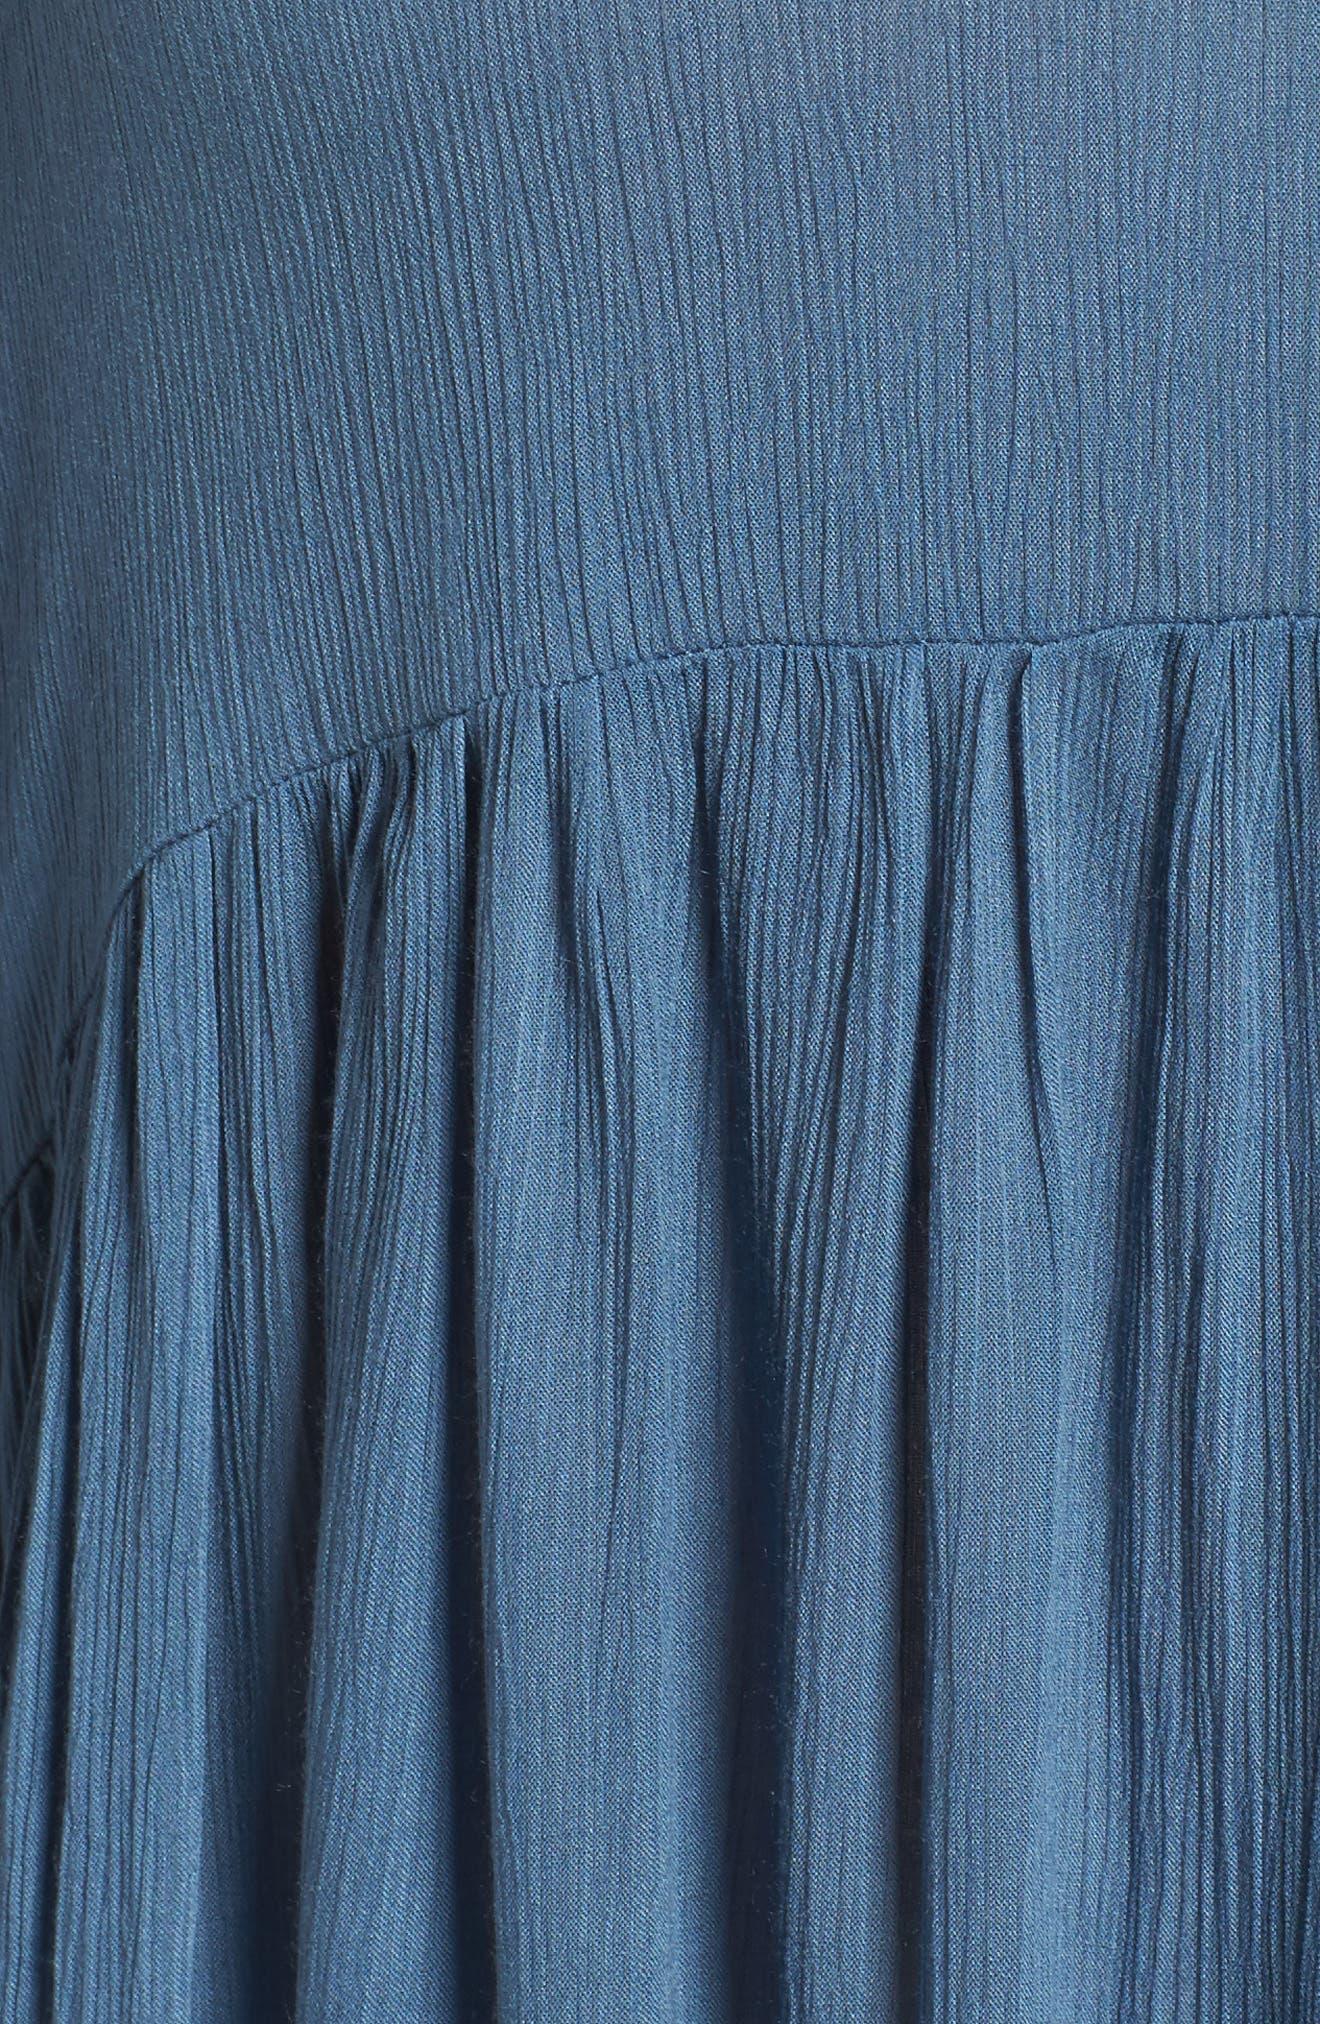 Button Front Shirtdress,                             Alternate thumbnail 5, color,                             455